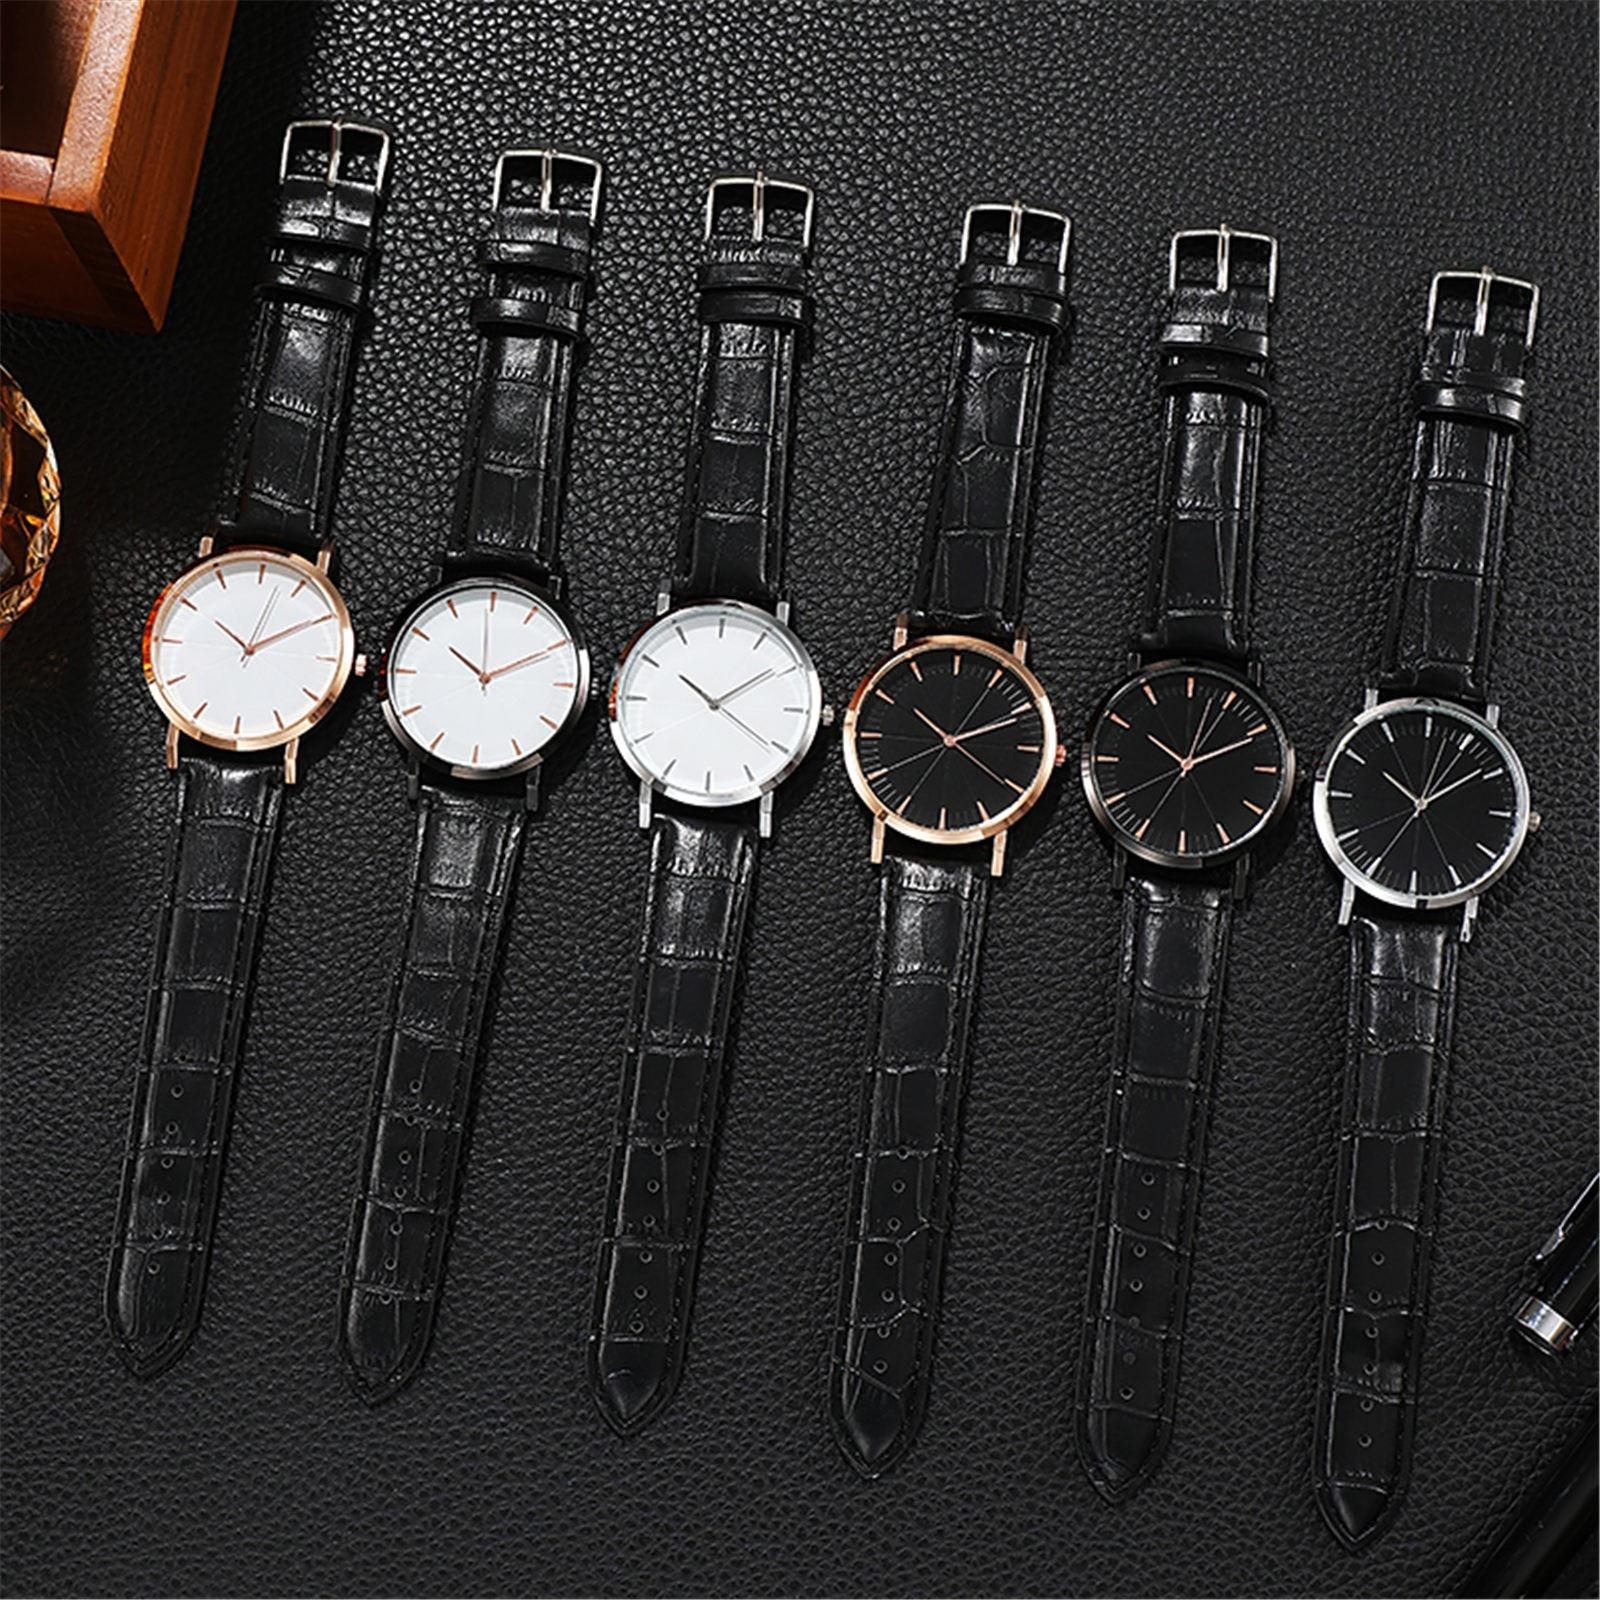 Leather Men's Business Quartz Watch Beautiful 2021 Design